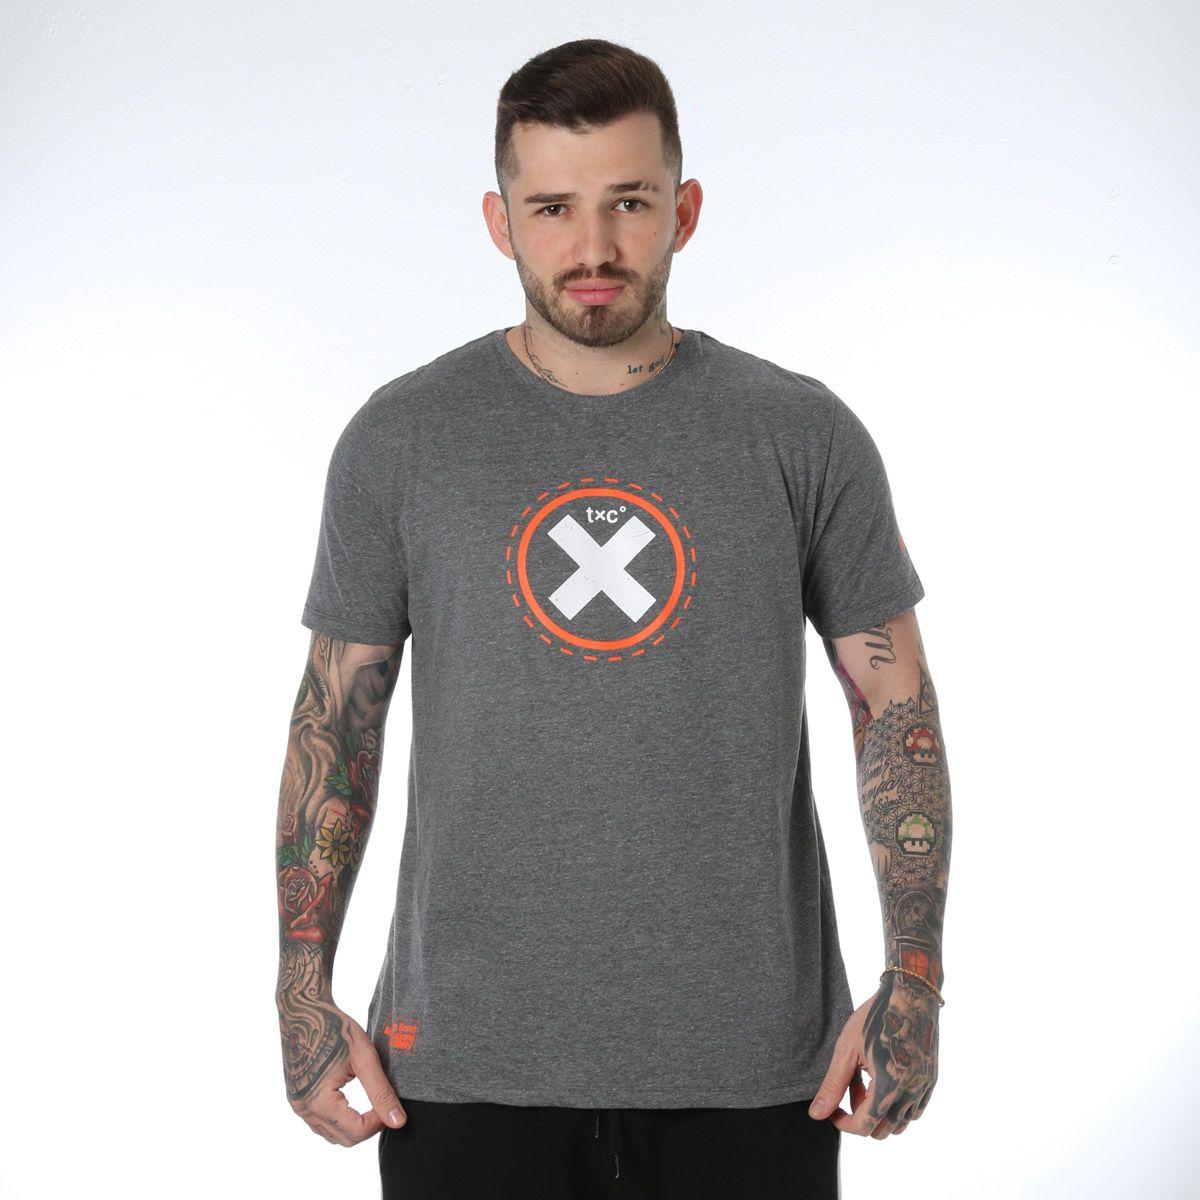 Camiseta Masculina TXC 1766